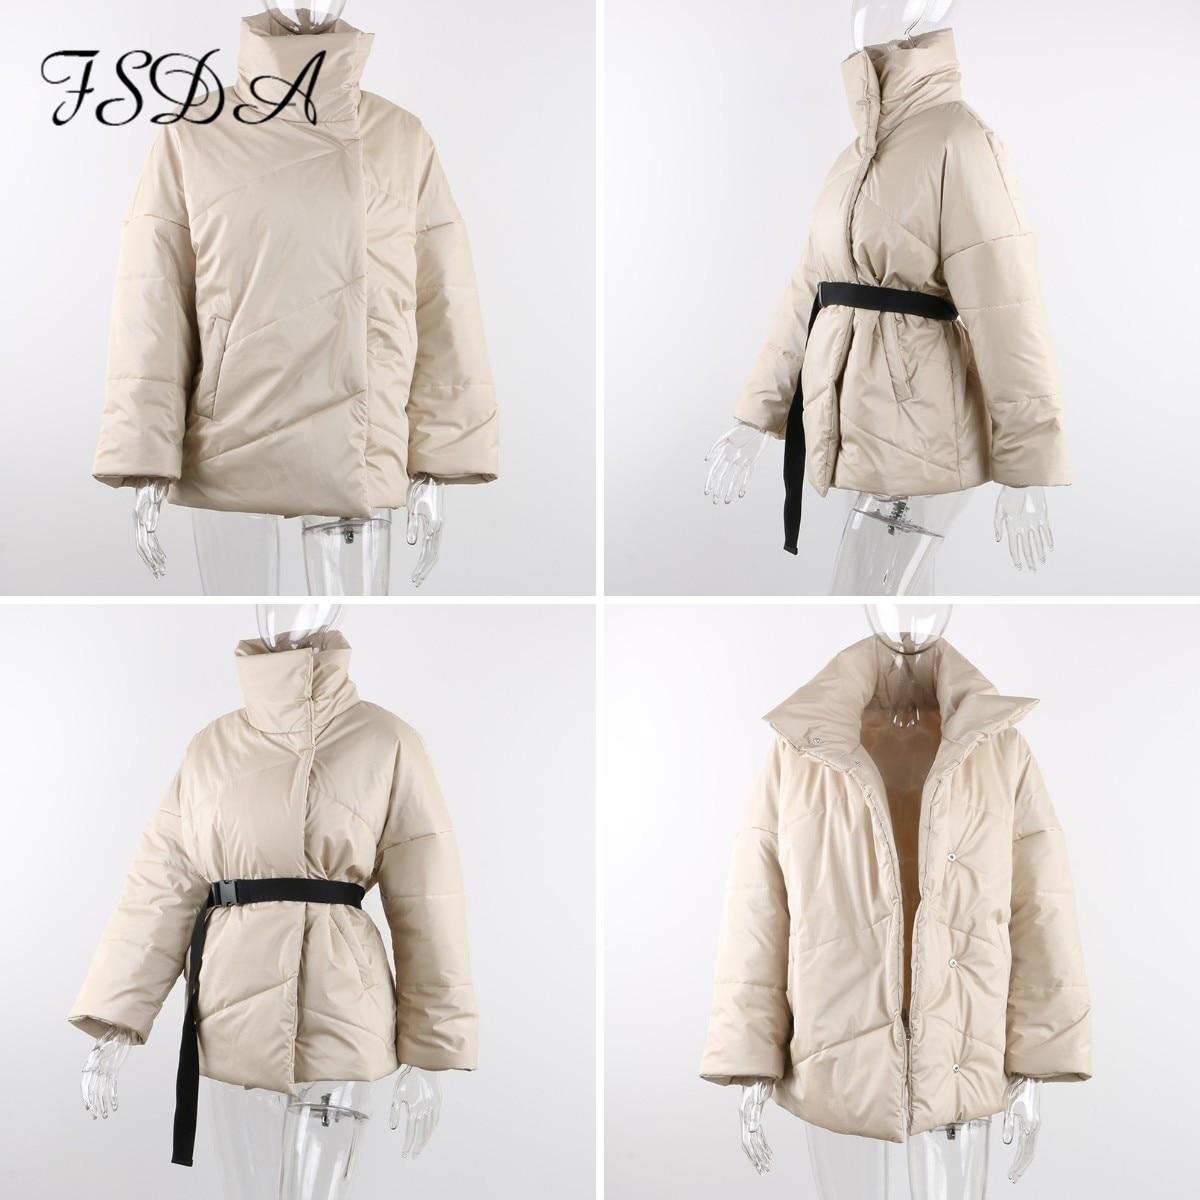 FSDA Autumn Winter Women Coat Jacket Parkas Warm With Belt Casual 2020 Loose Pocket Bubble Khaki Sashes Short Jackets Thick